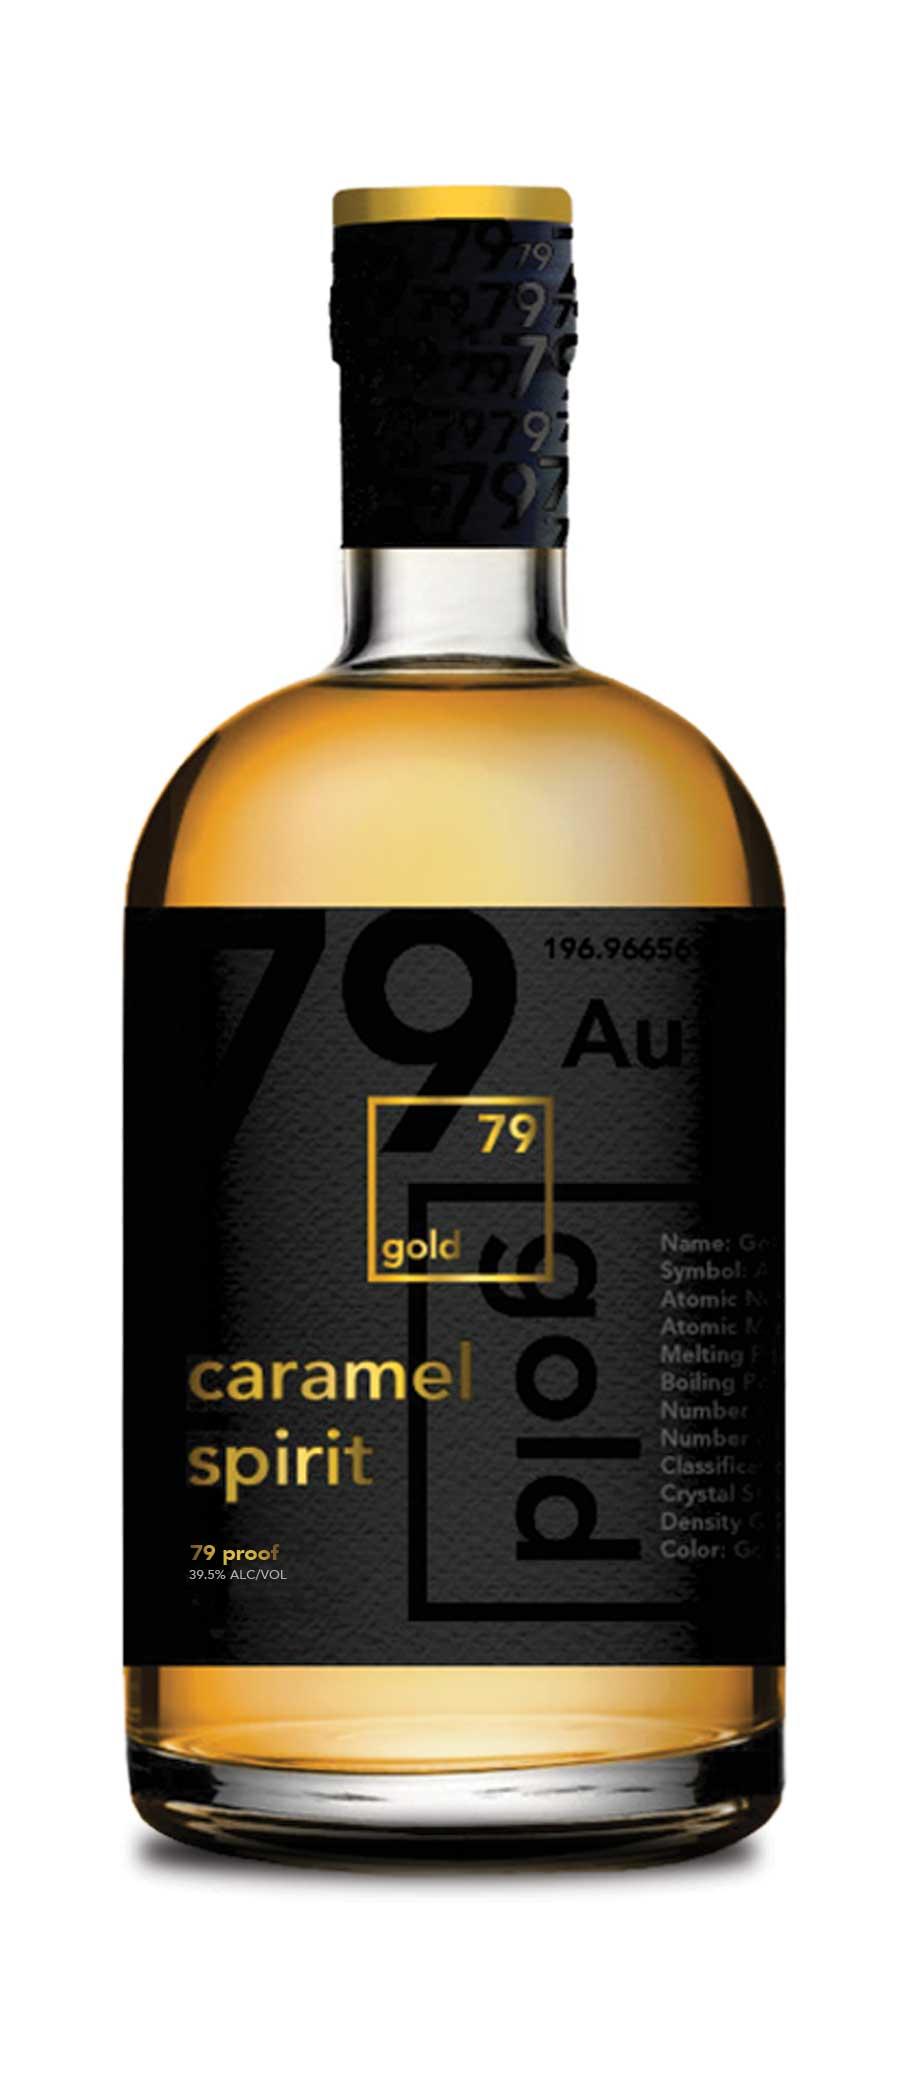 79 Caramel Spirit